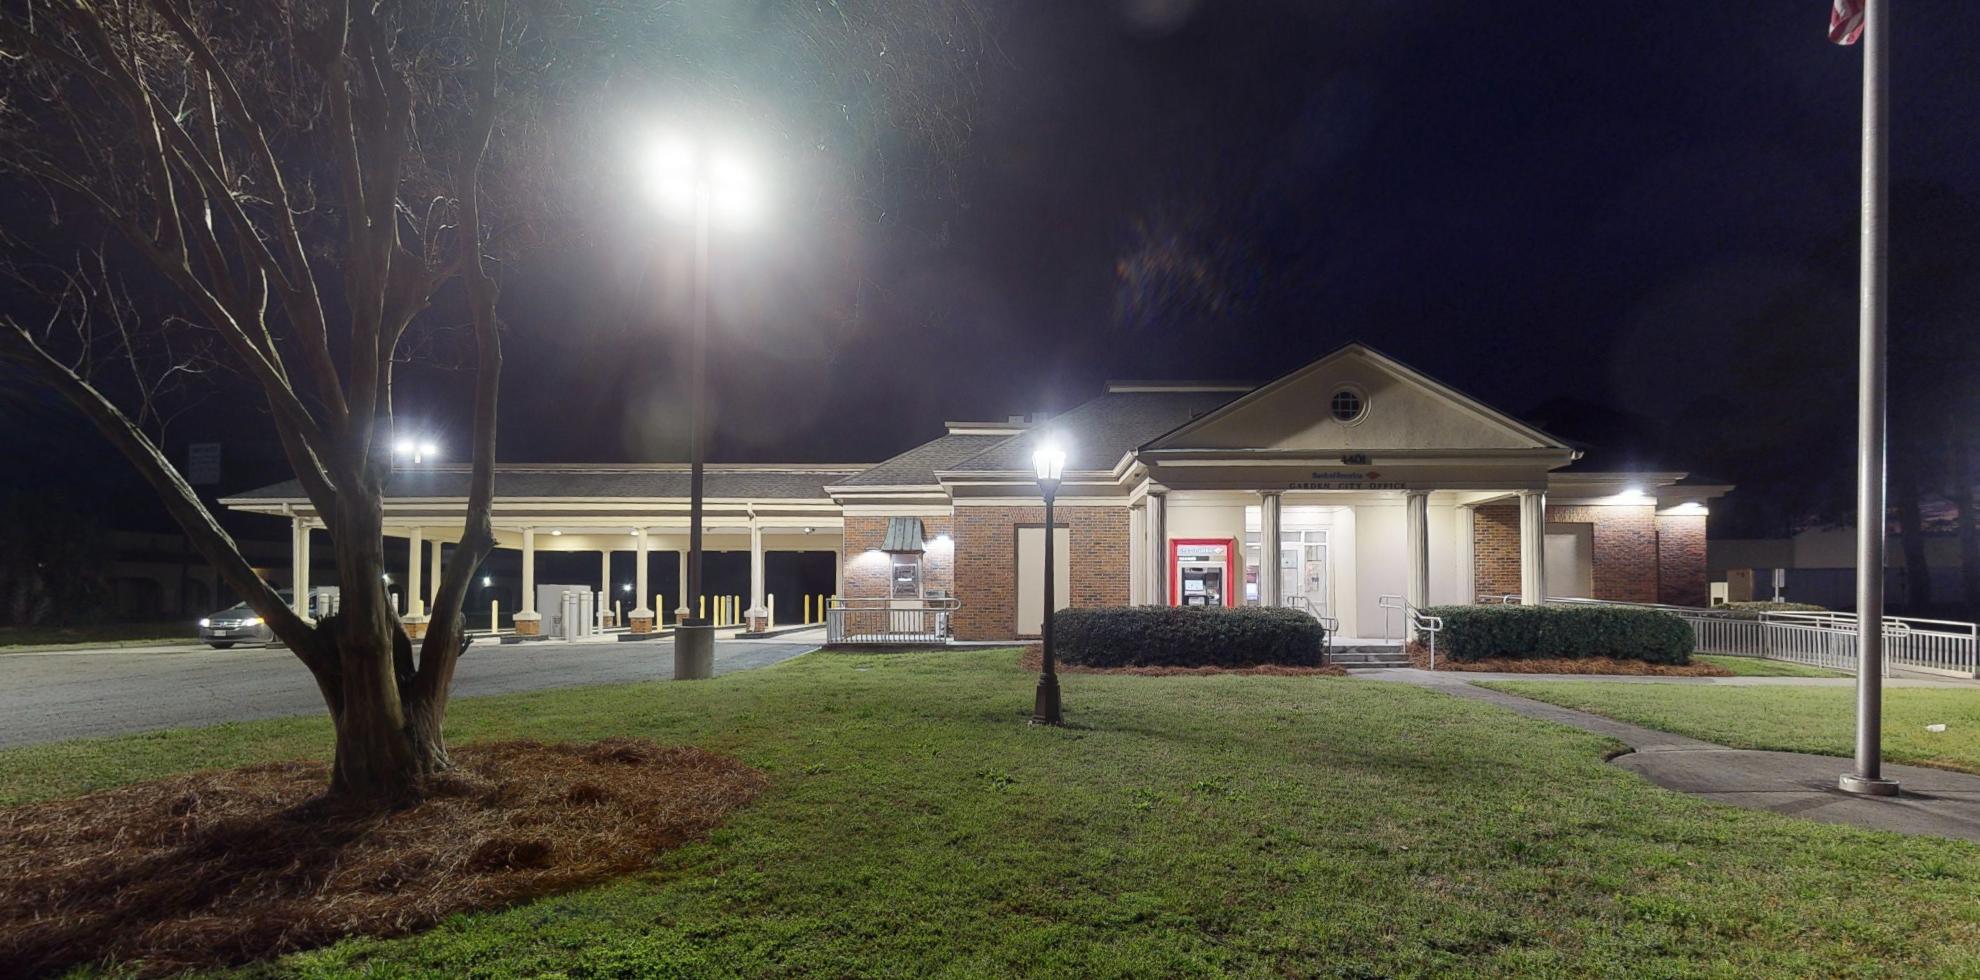 Bank of America financial center with drive-thru ATM   4401 Augusta Rd, Savannah, GA 31408